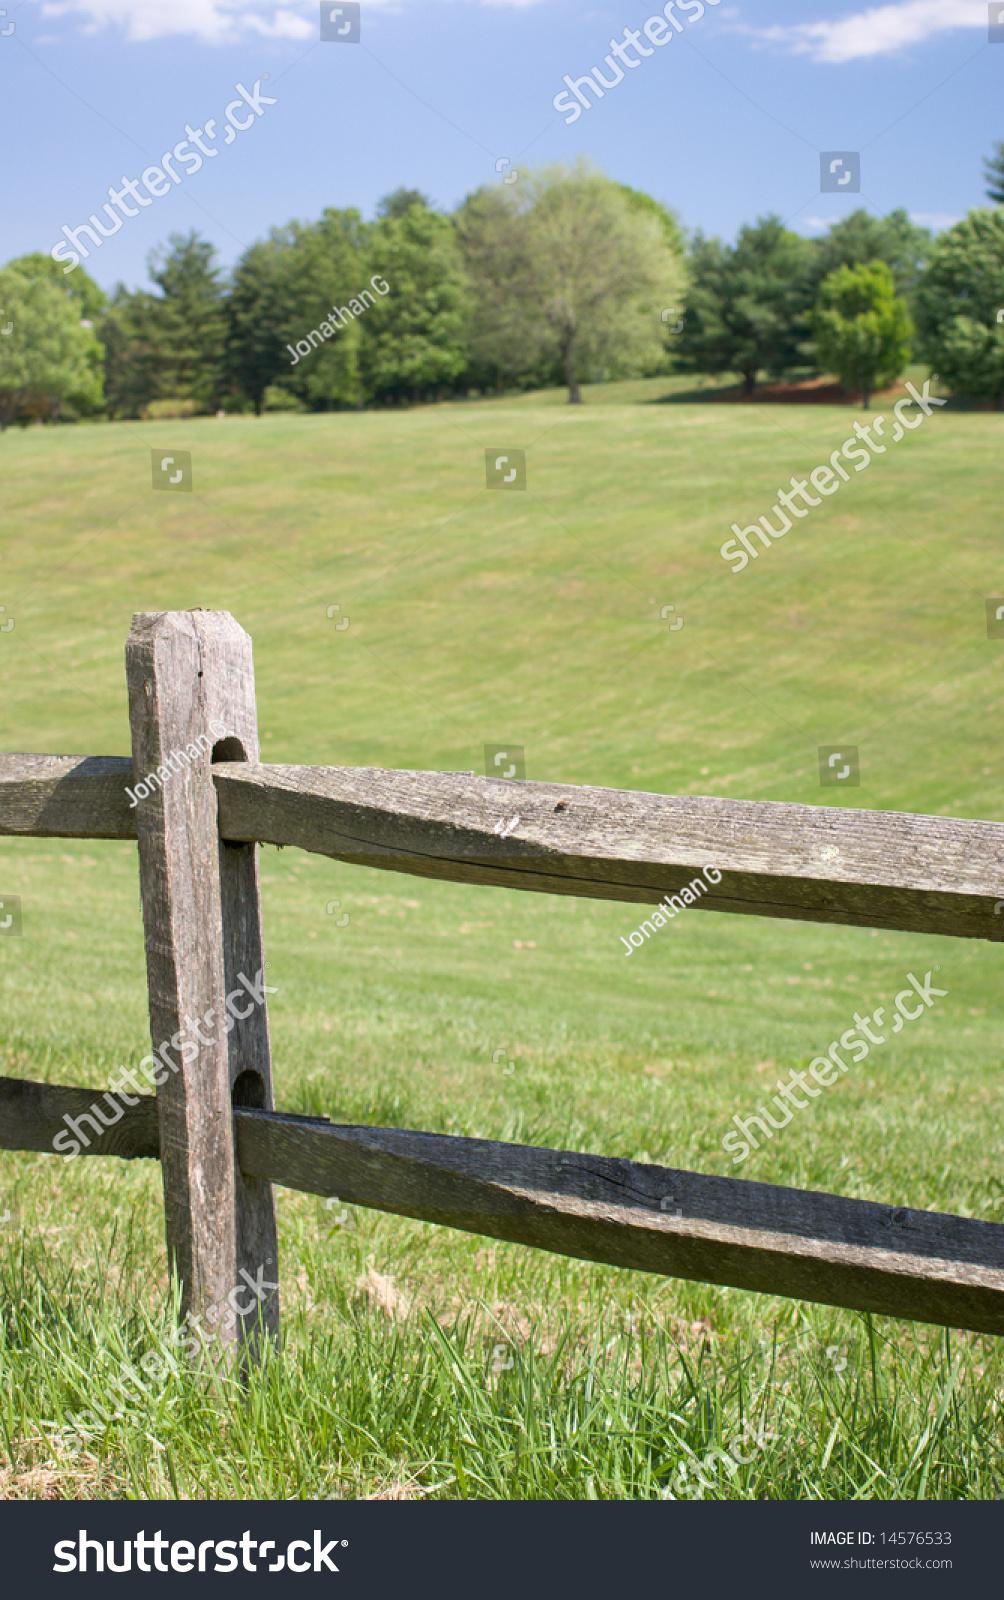 Wood split rail fence grassy landscape stock photo